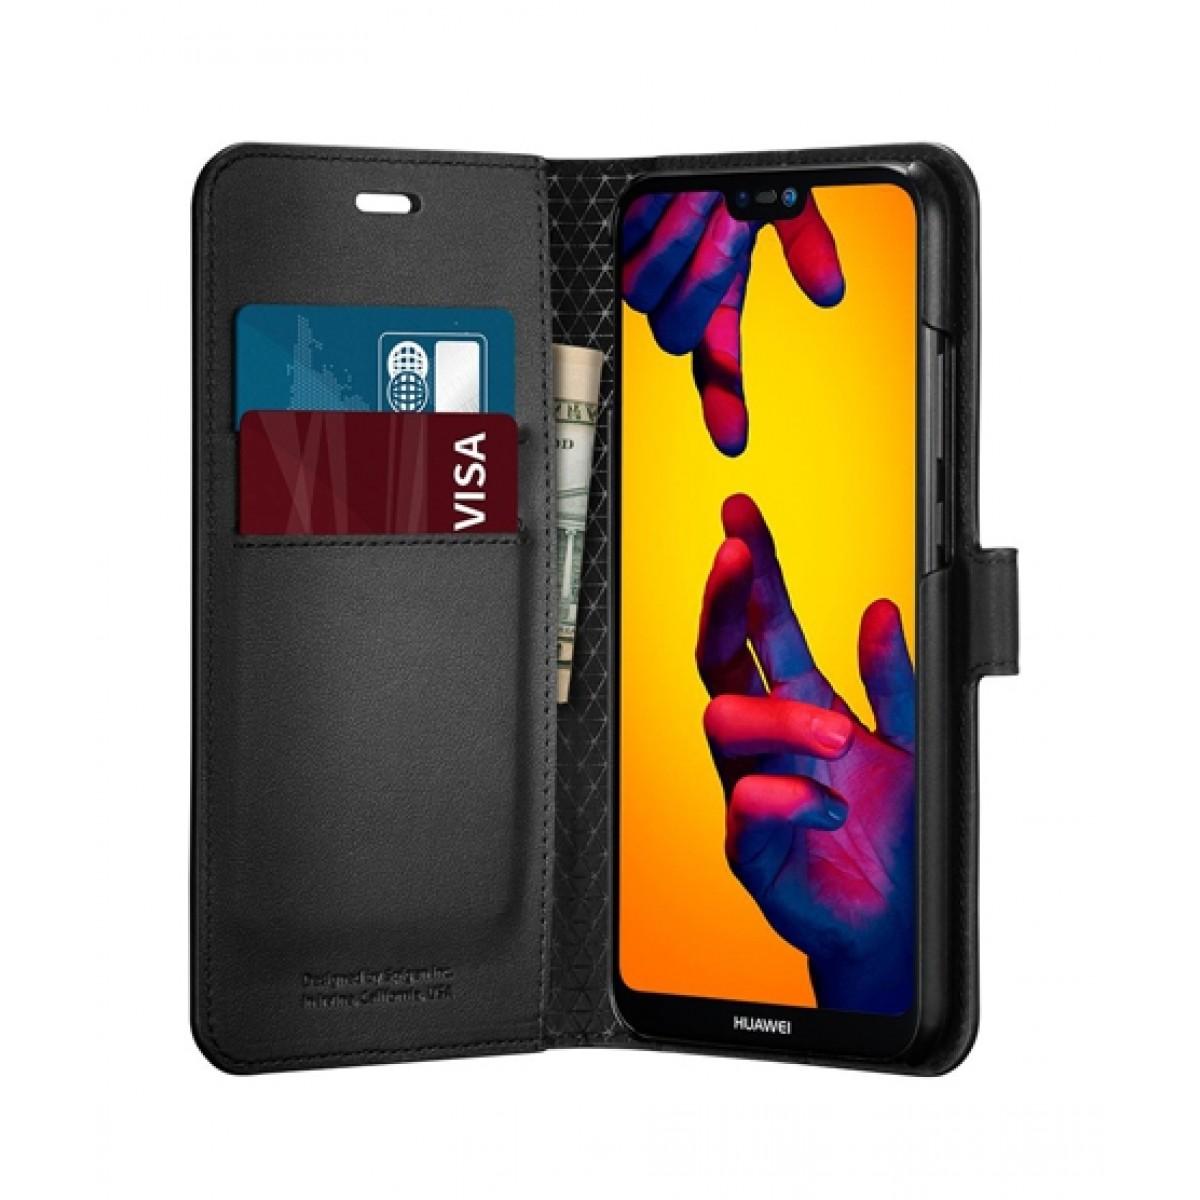 huge discount 309ac 10a99 Spigen Wallet S Clear Case For Huawei P20 Lite